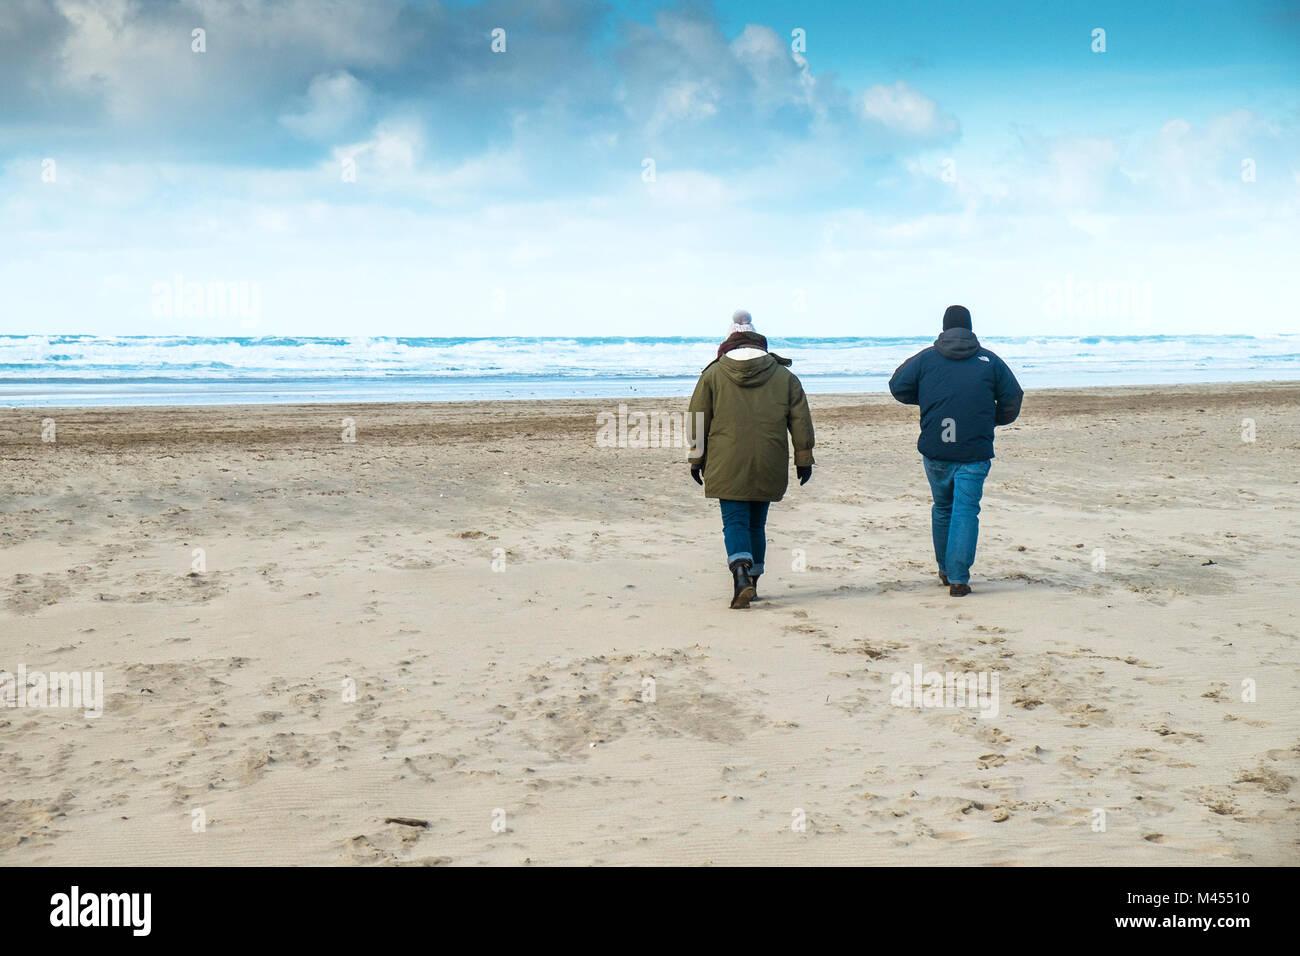 Zwei Menschen gehüllt vor dem kalten Wetter zu Fuß am Strand. Stockbild